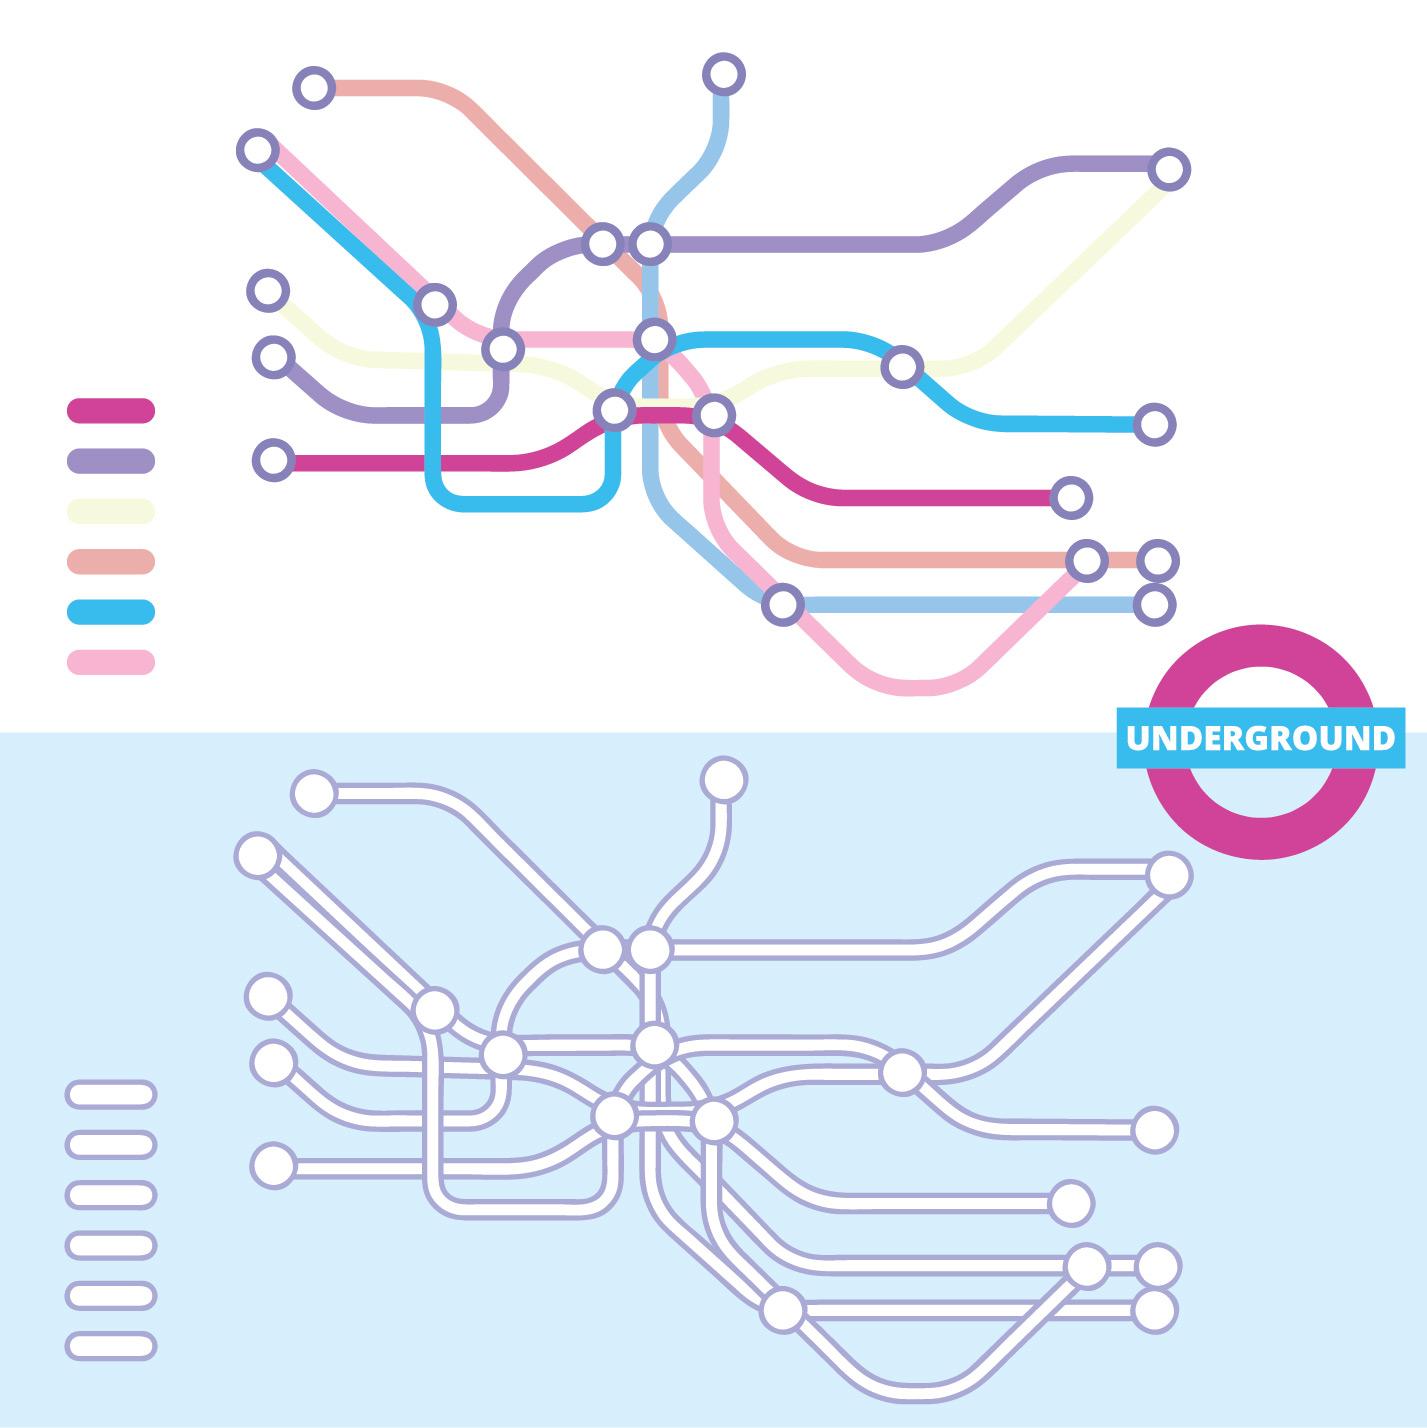 Underground Vector Vector Tube Map - Down...